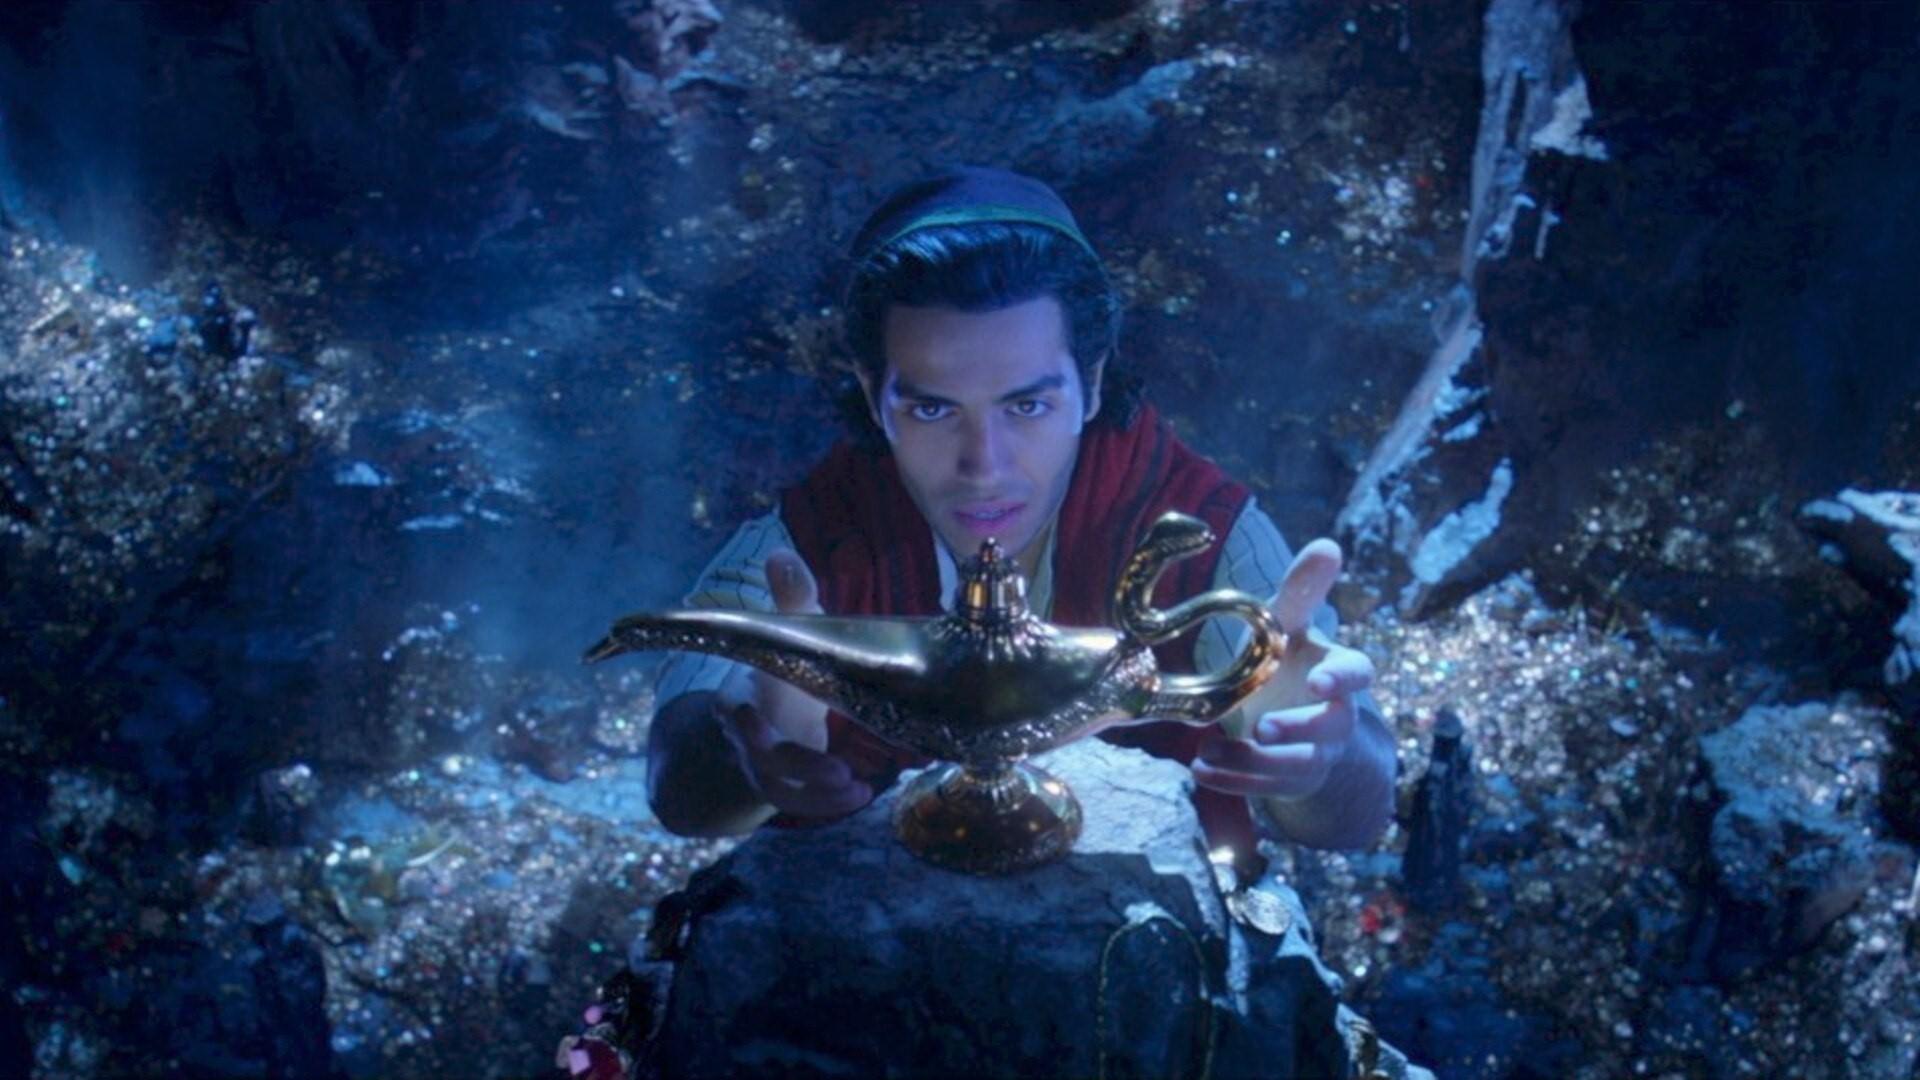 Hollywood Movies Hd Wallpapers: Mena Massoud As Aladdin In 2019 Film Aladdin